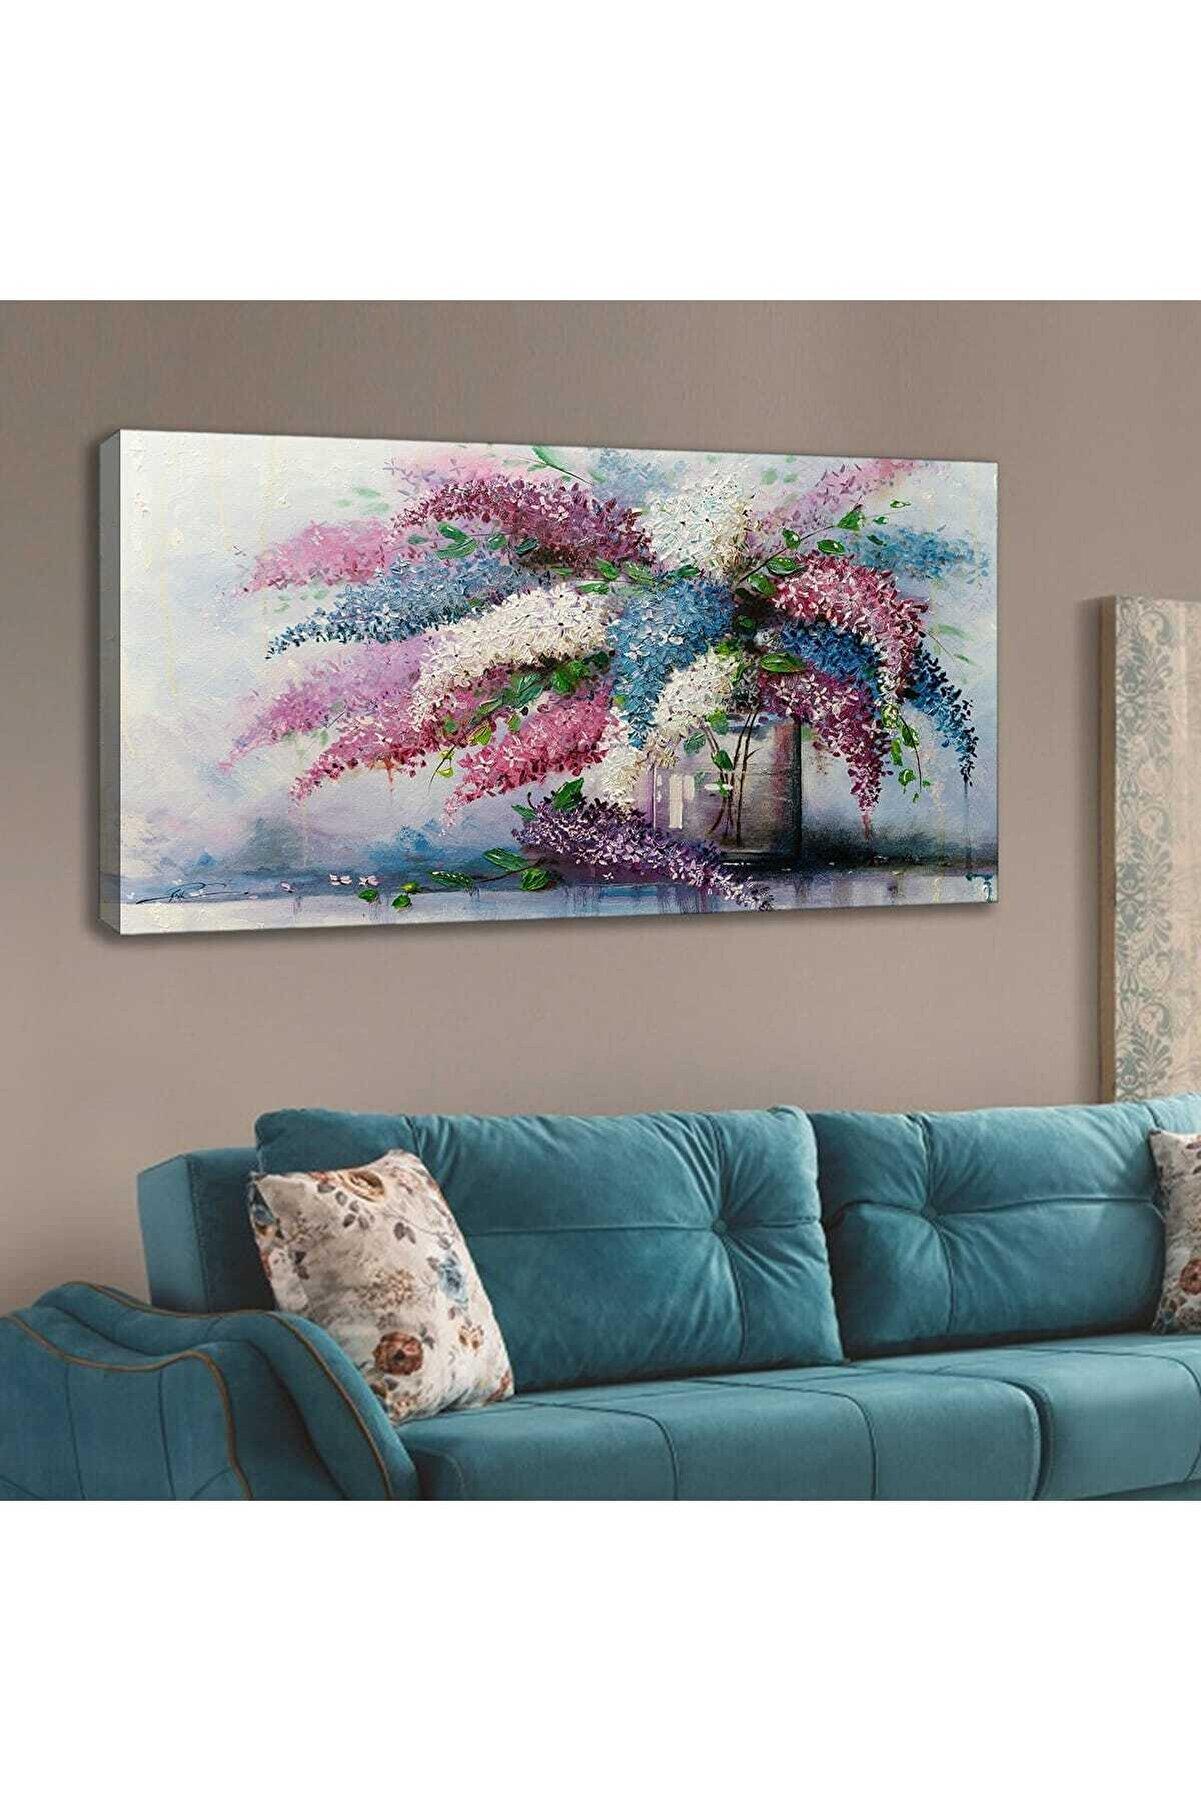 Lora Stil 120x60 Cm Kanvas Tablo